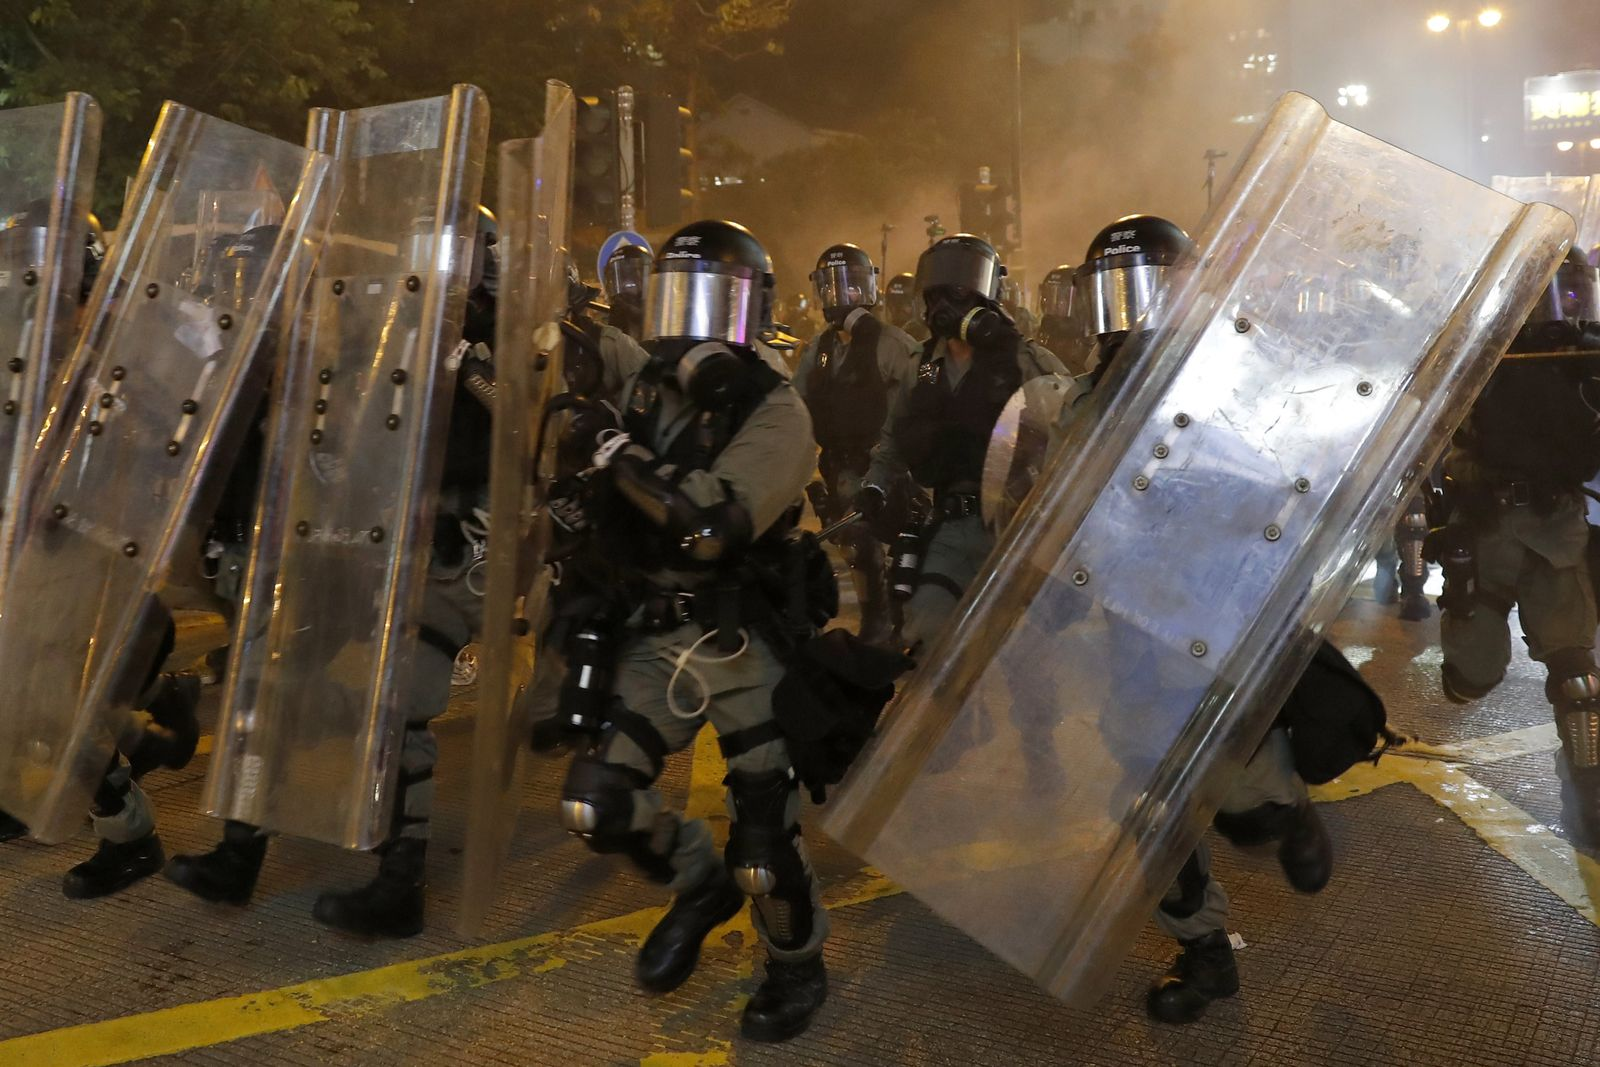 Demonstrationen in Hongkong